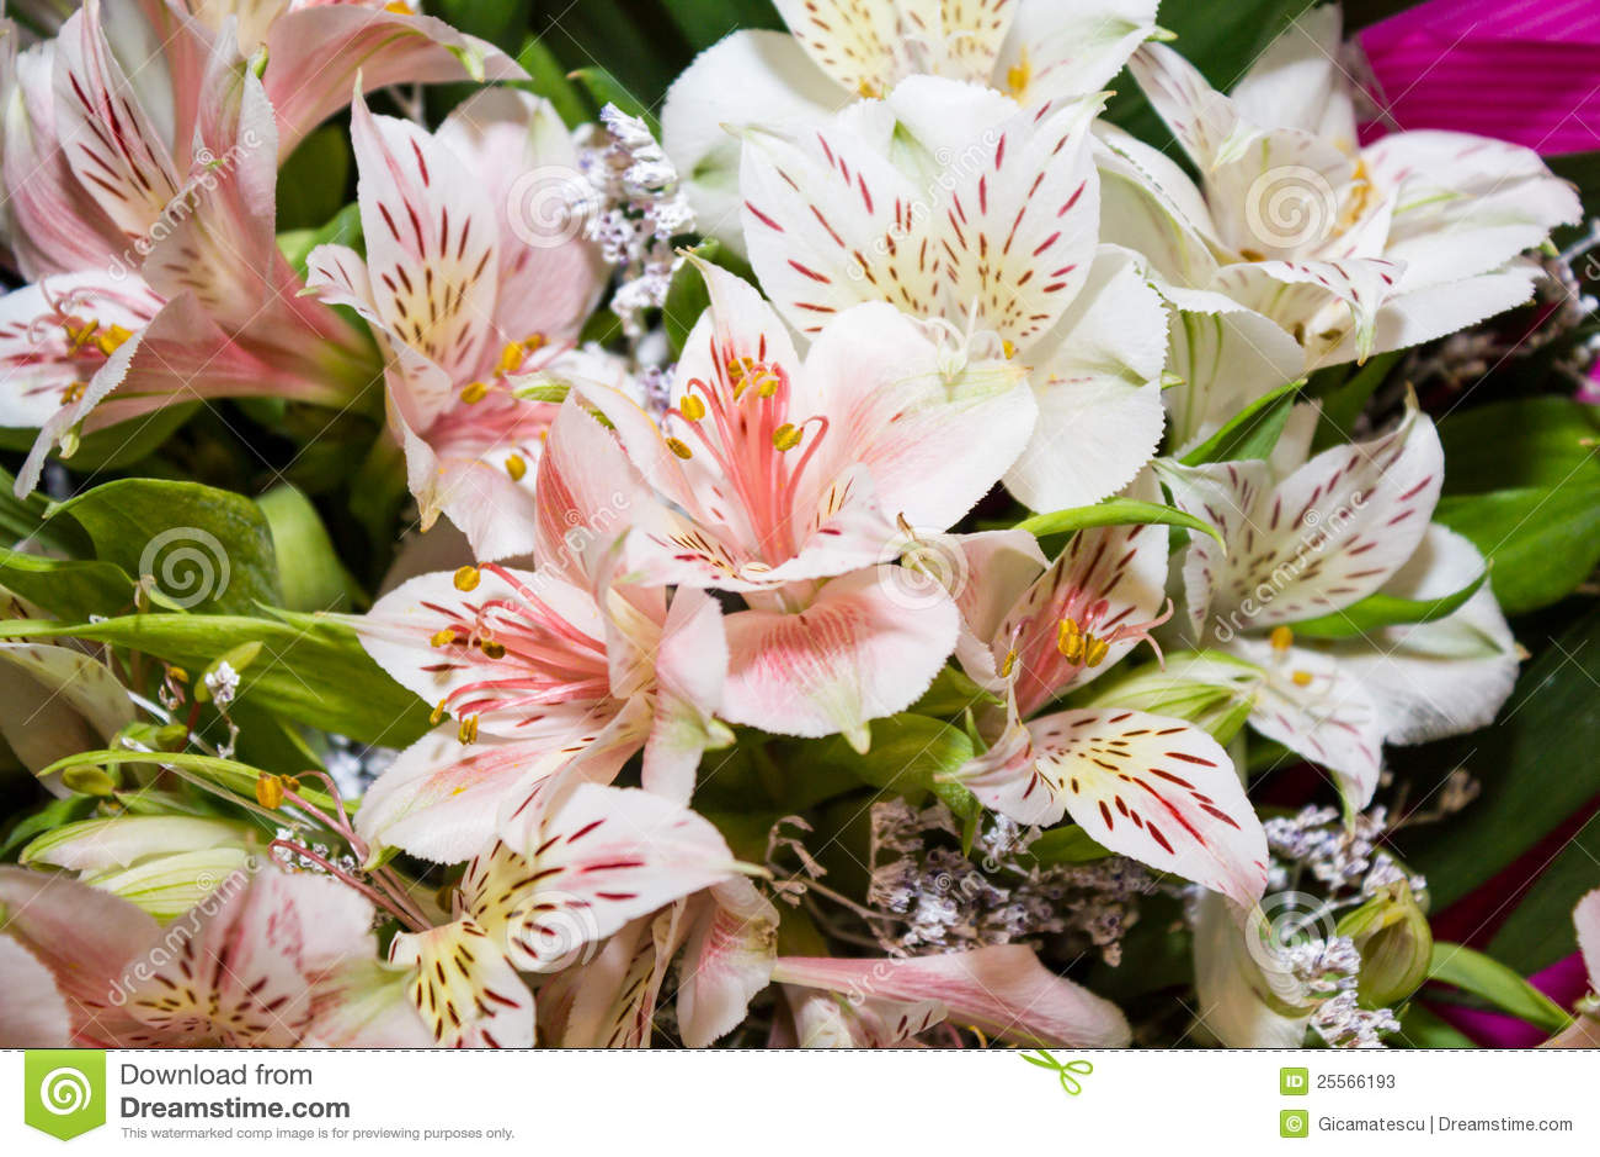 Stargazer lilies stock image image of fragile delicate 25566193 stargazer lilies mightylinksfo